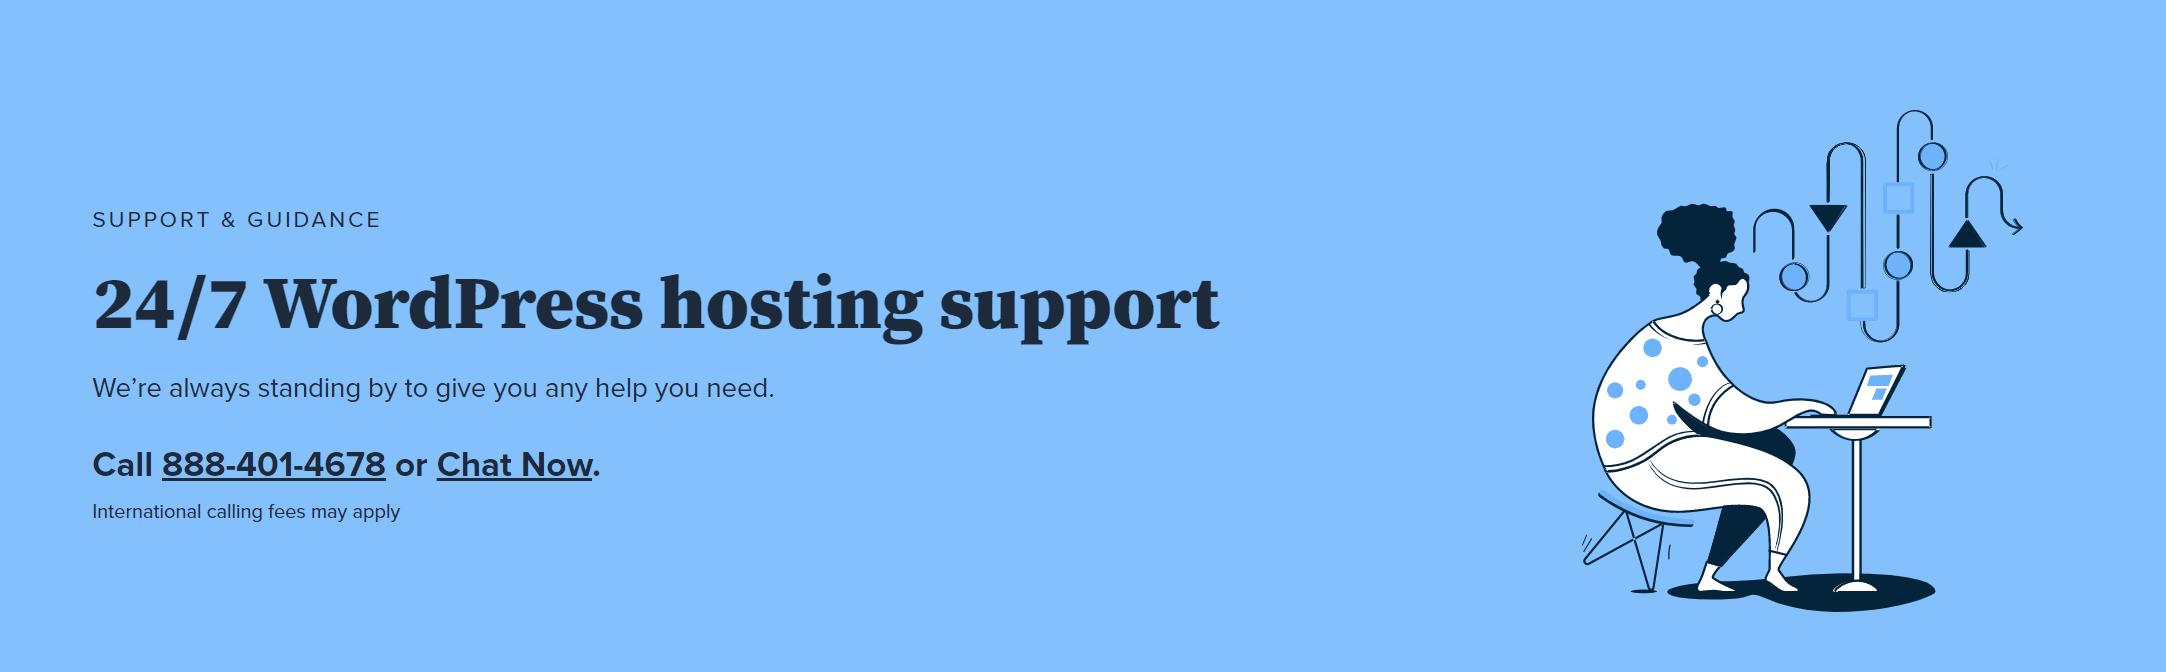 Bluehost-wordpress-support